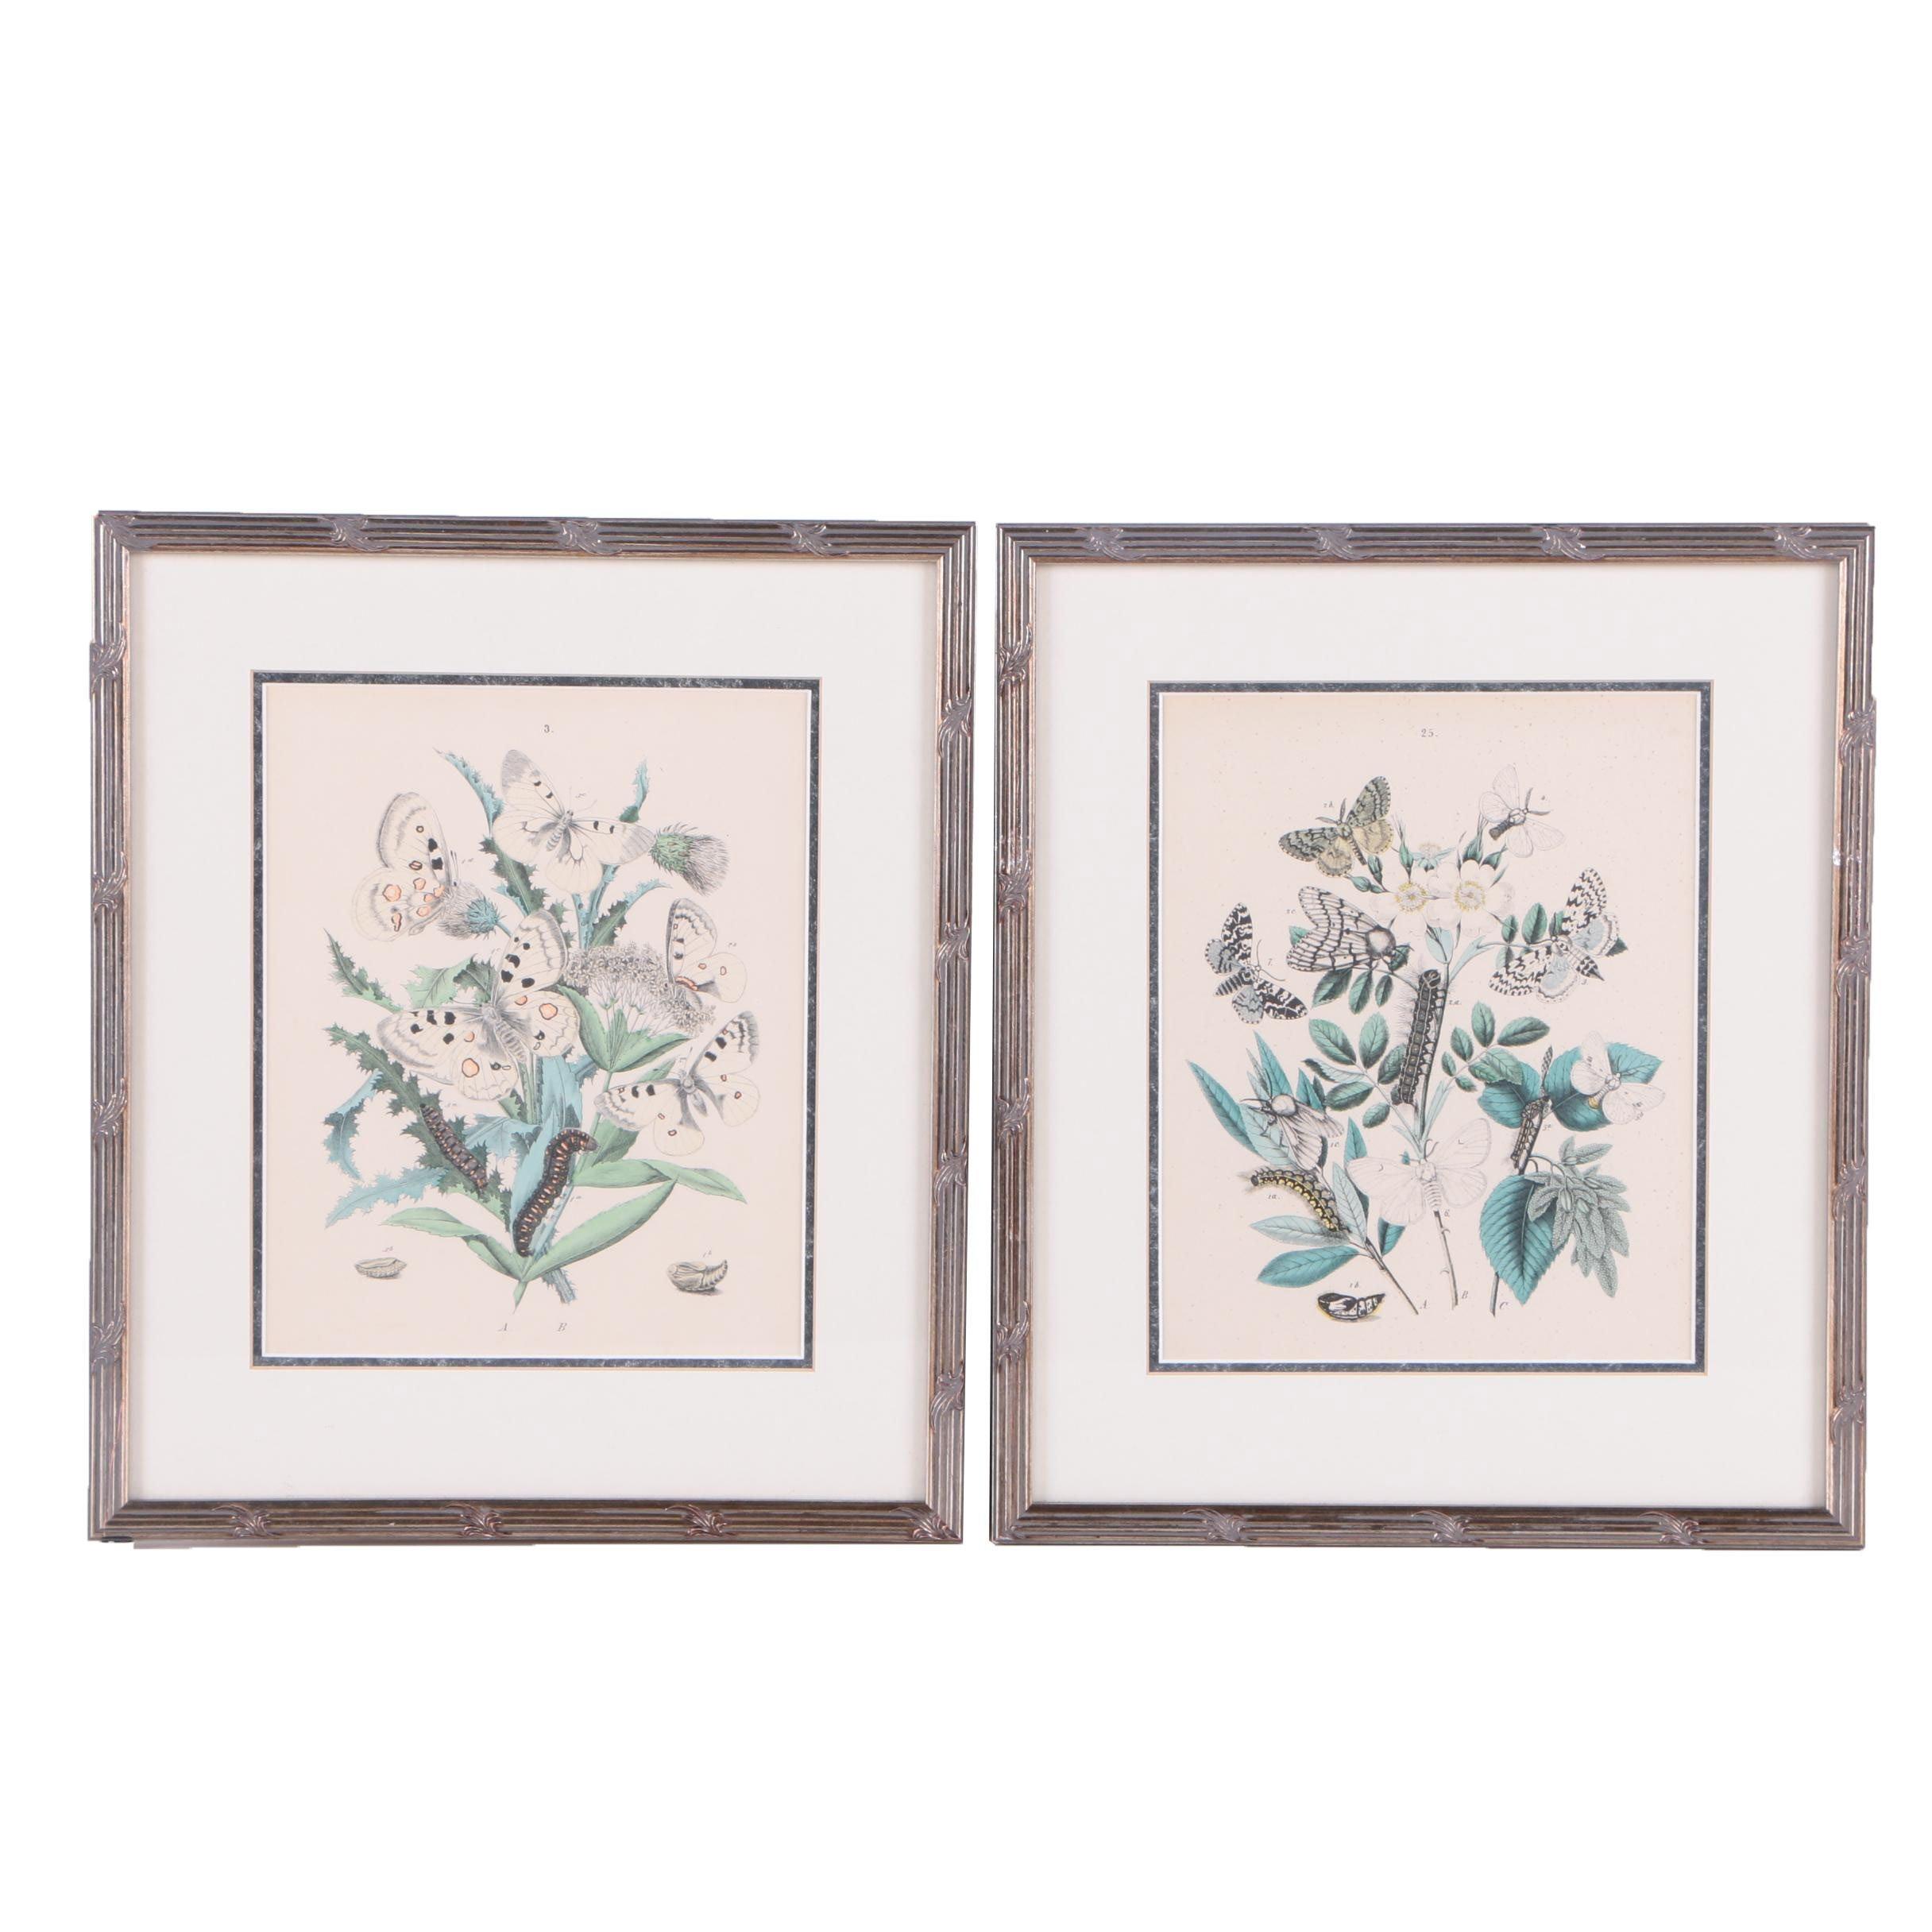 Pair of Hand-Colored Wood Engravings on Paper of Moths